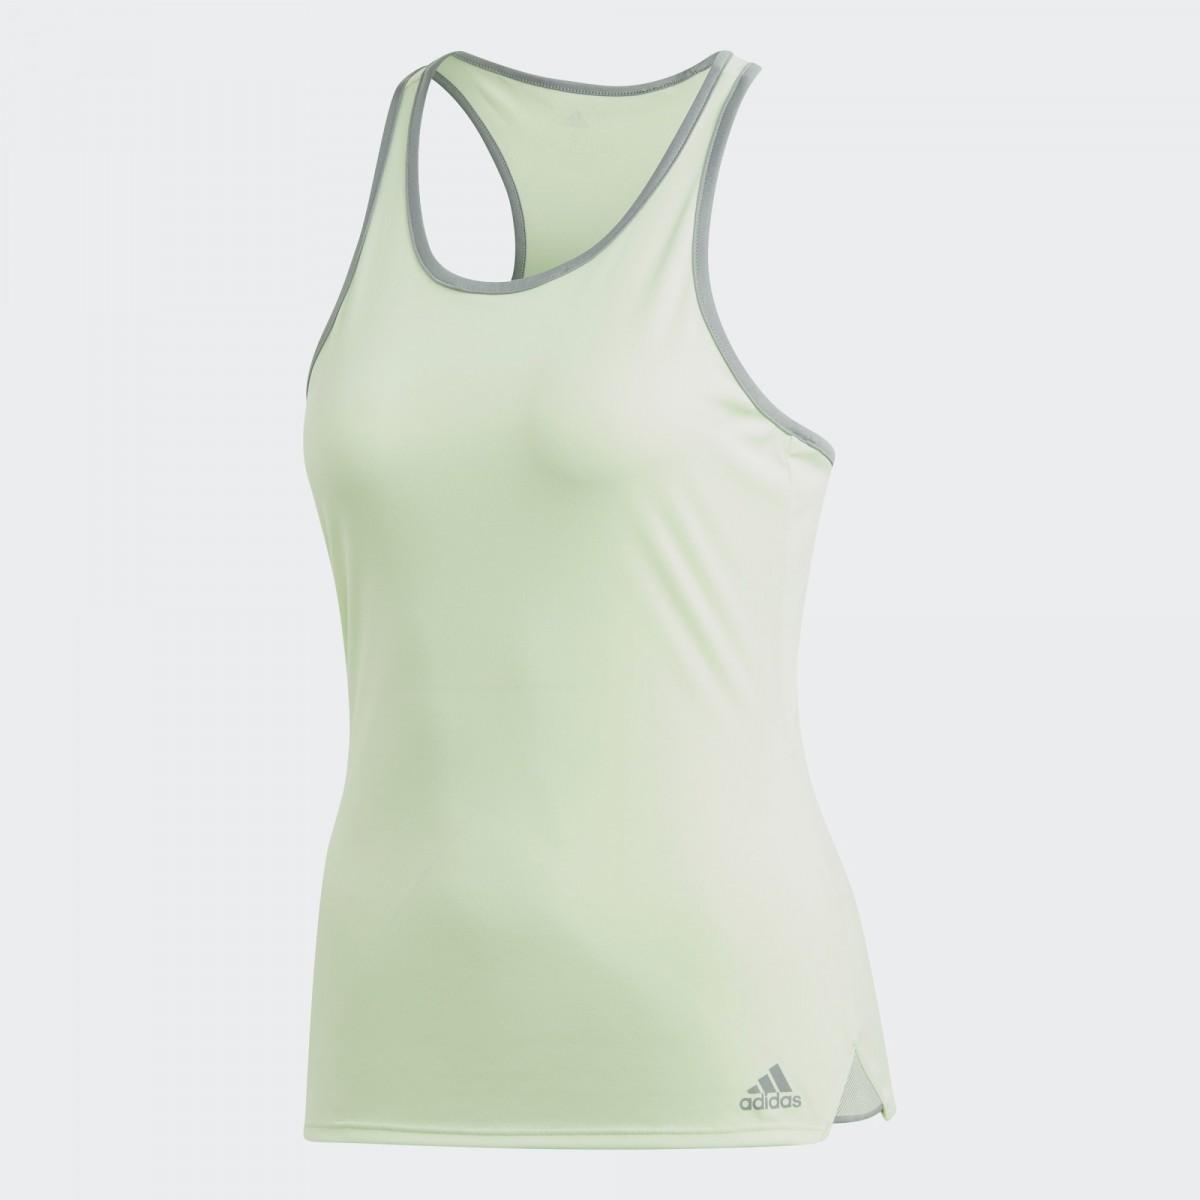 Теннисная майка женская Adidas Club Tank glow green